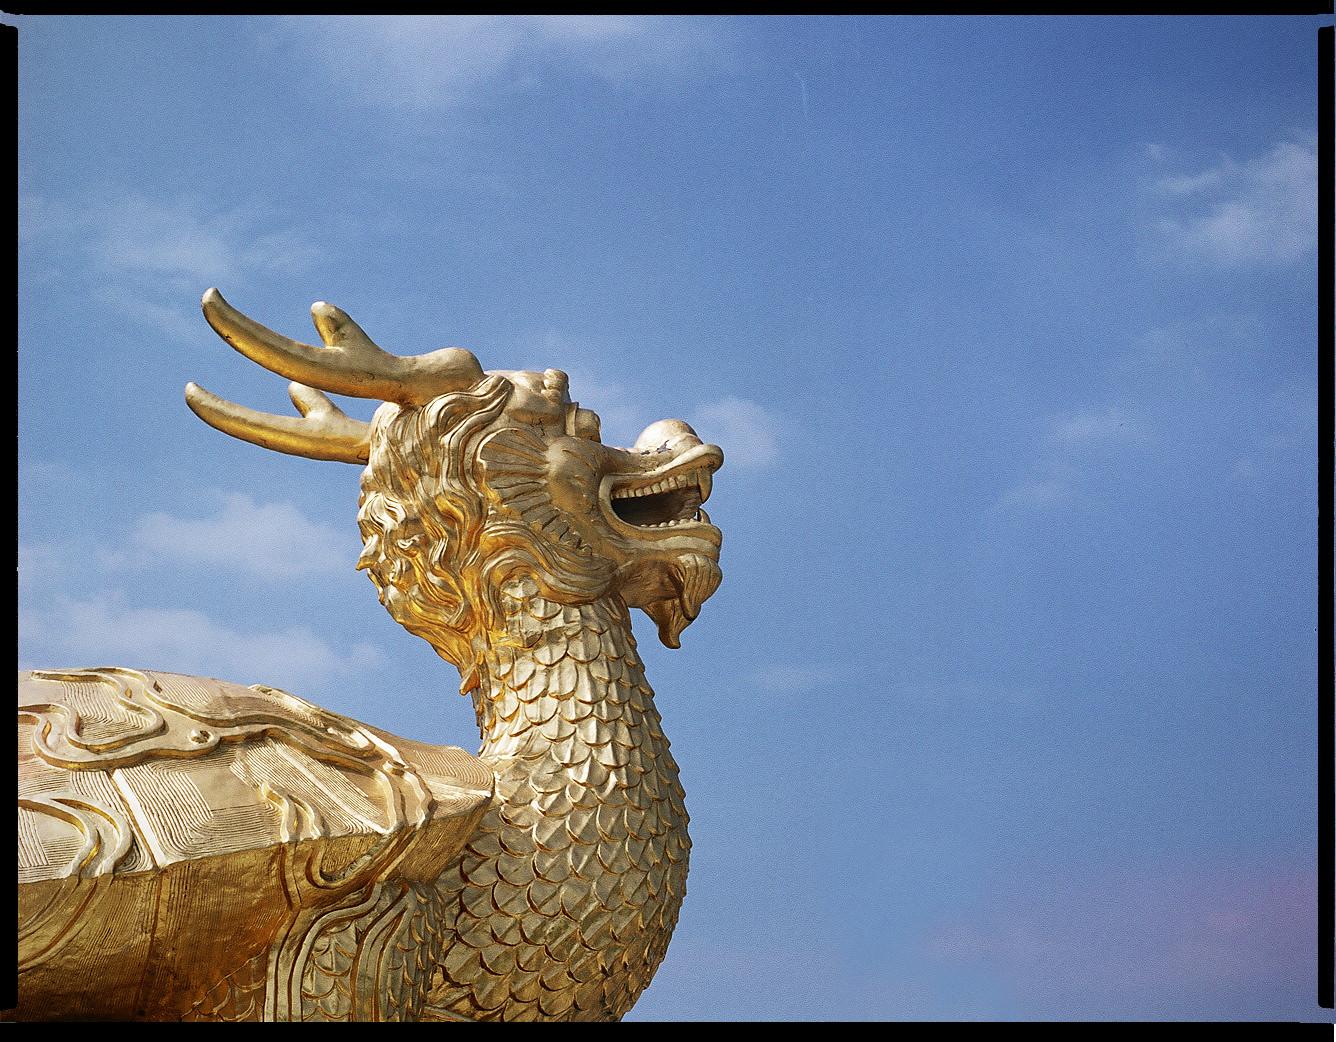 MediumFormatPatrikWallner_Gongguan_GoldenDragonPowerfulLOWQ